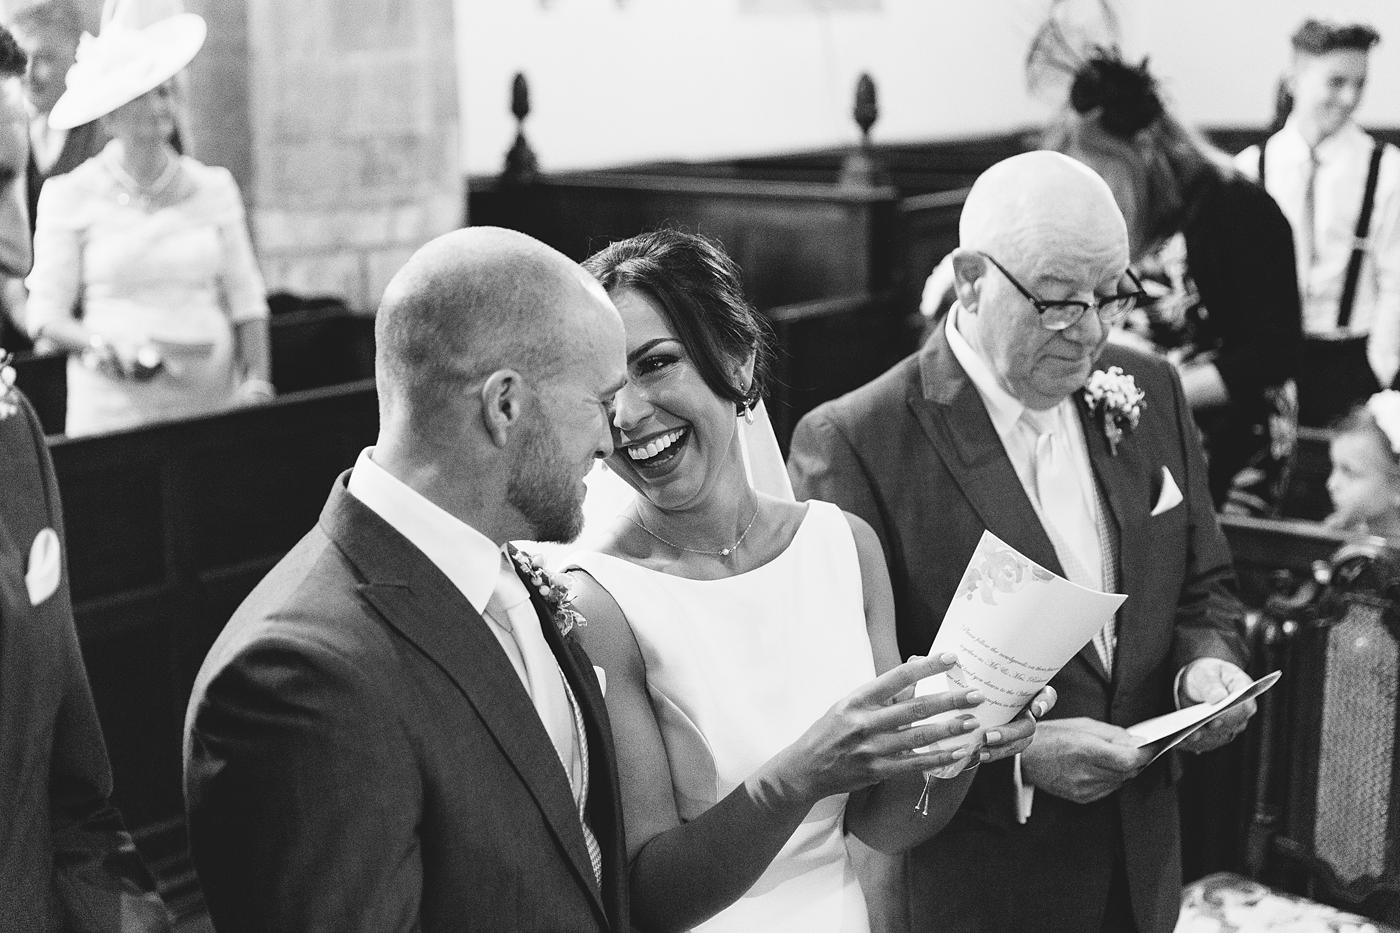 Winstanstow wedding photography 0390